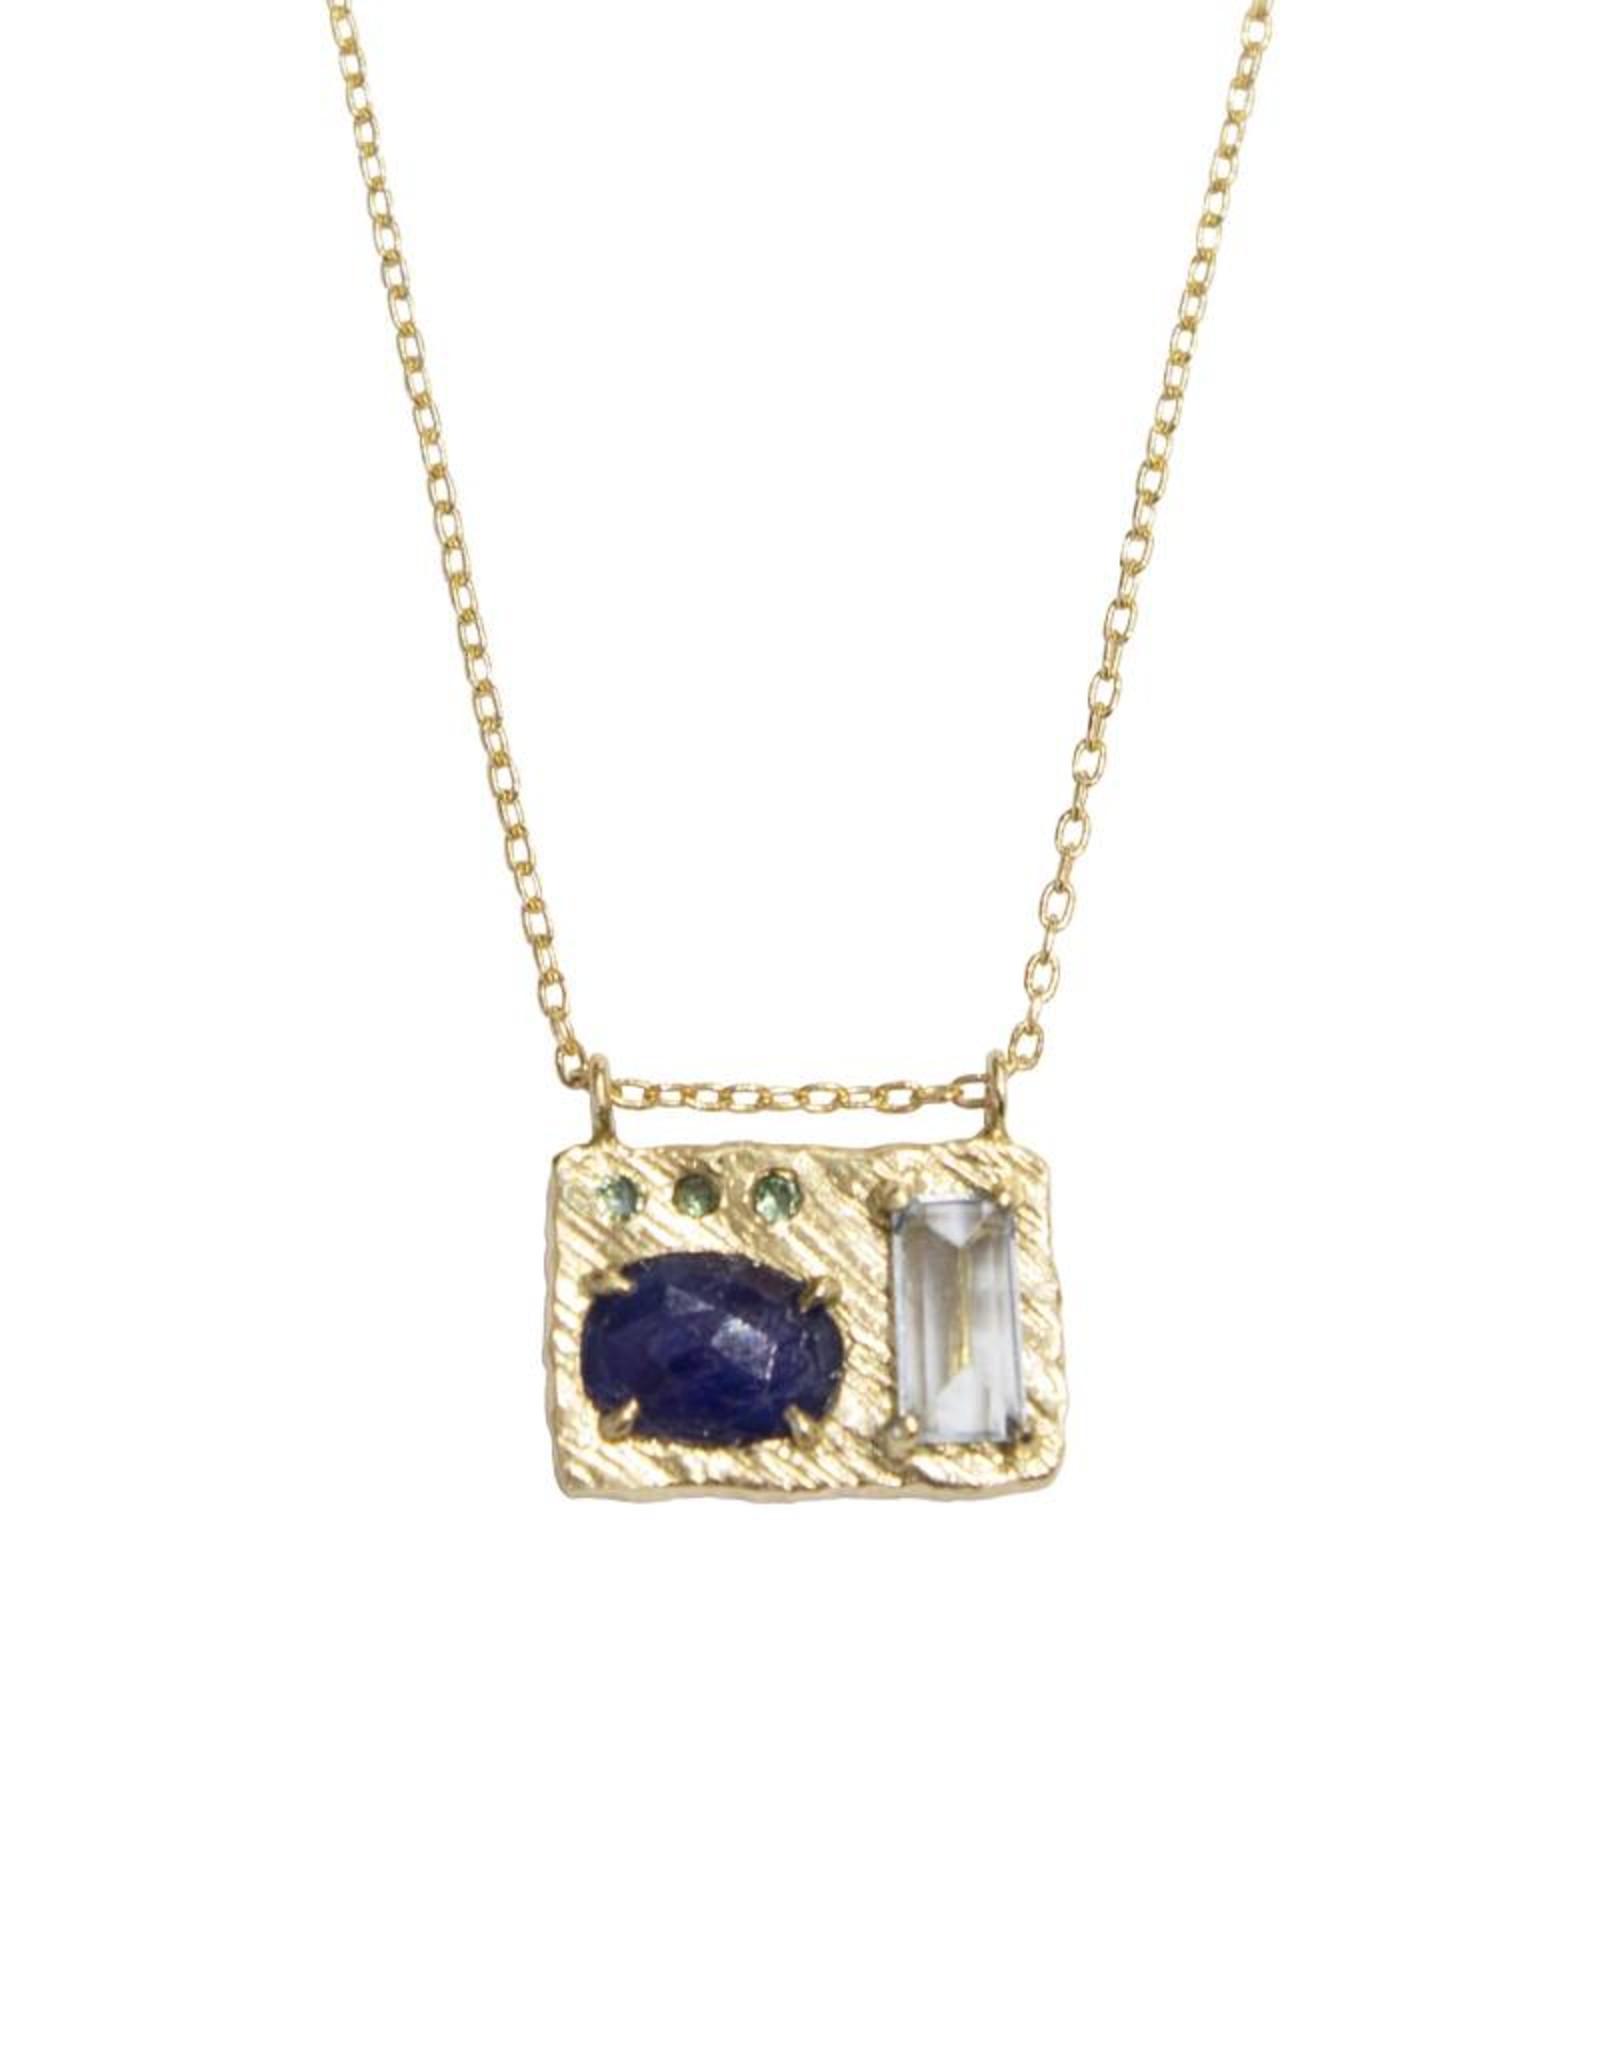 Lio & Linn Collage Necklace - Blue Sapphire + Blue Topaz